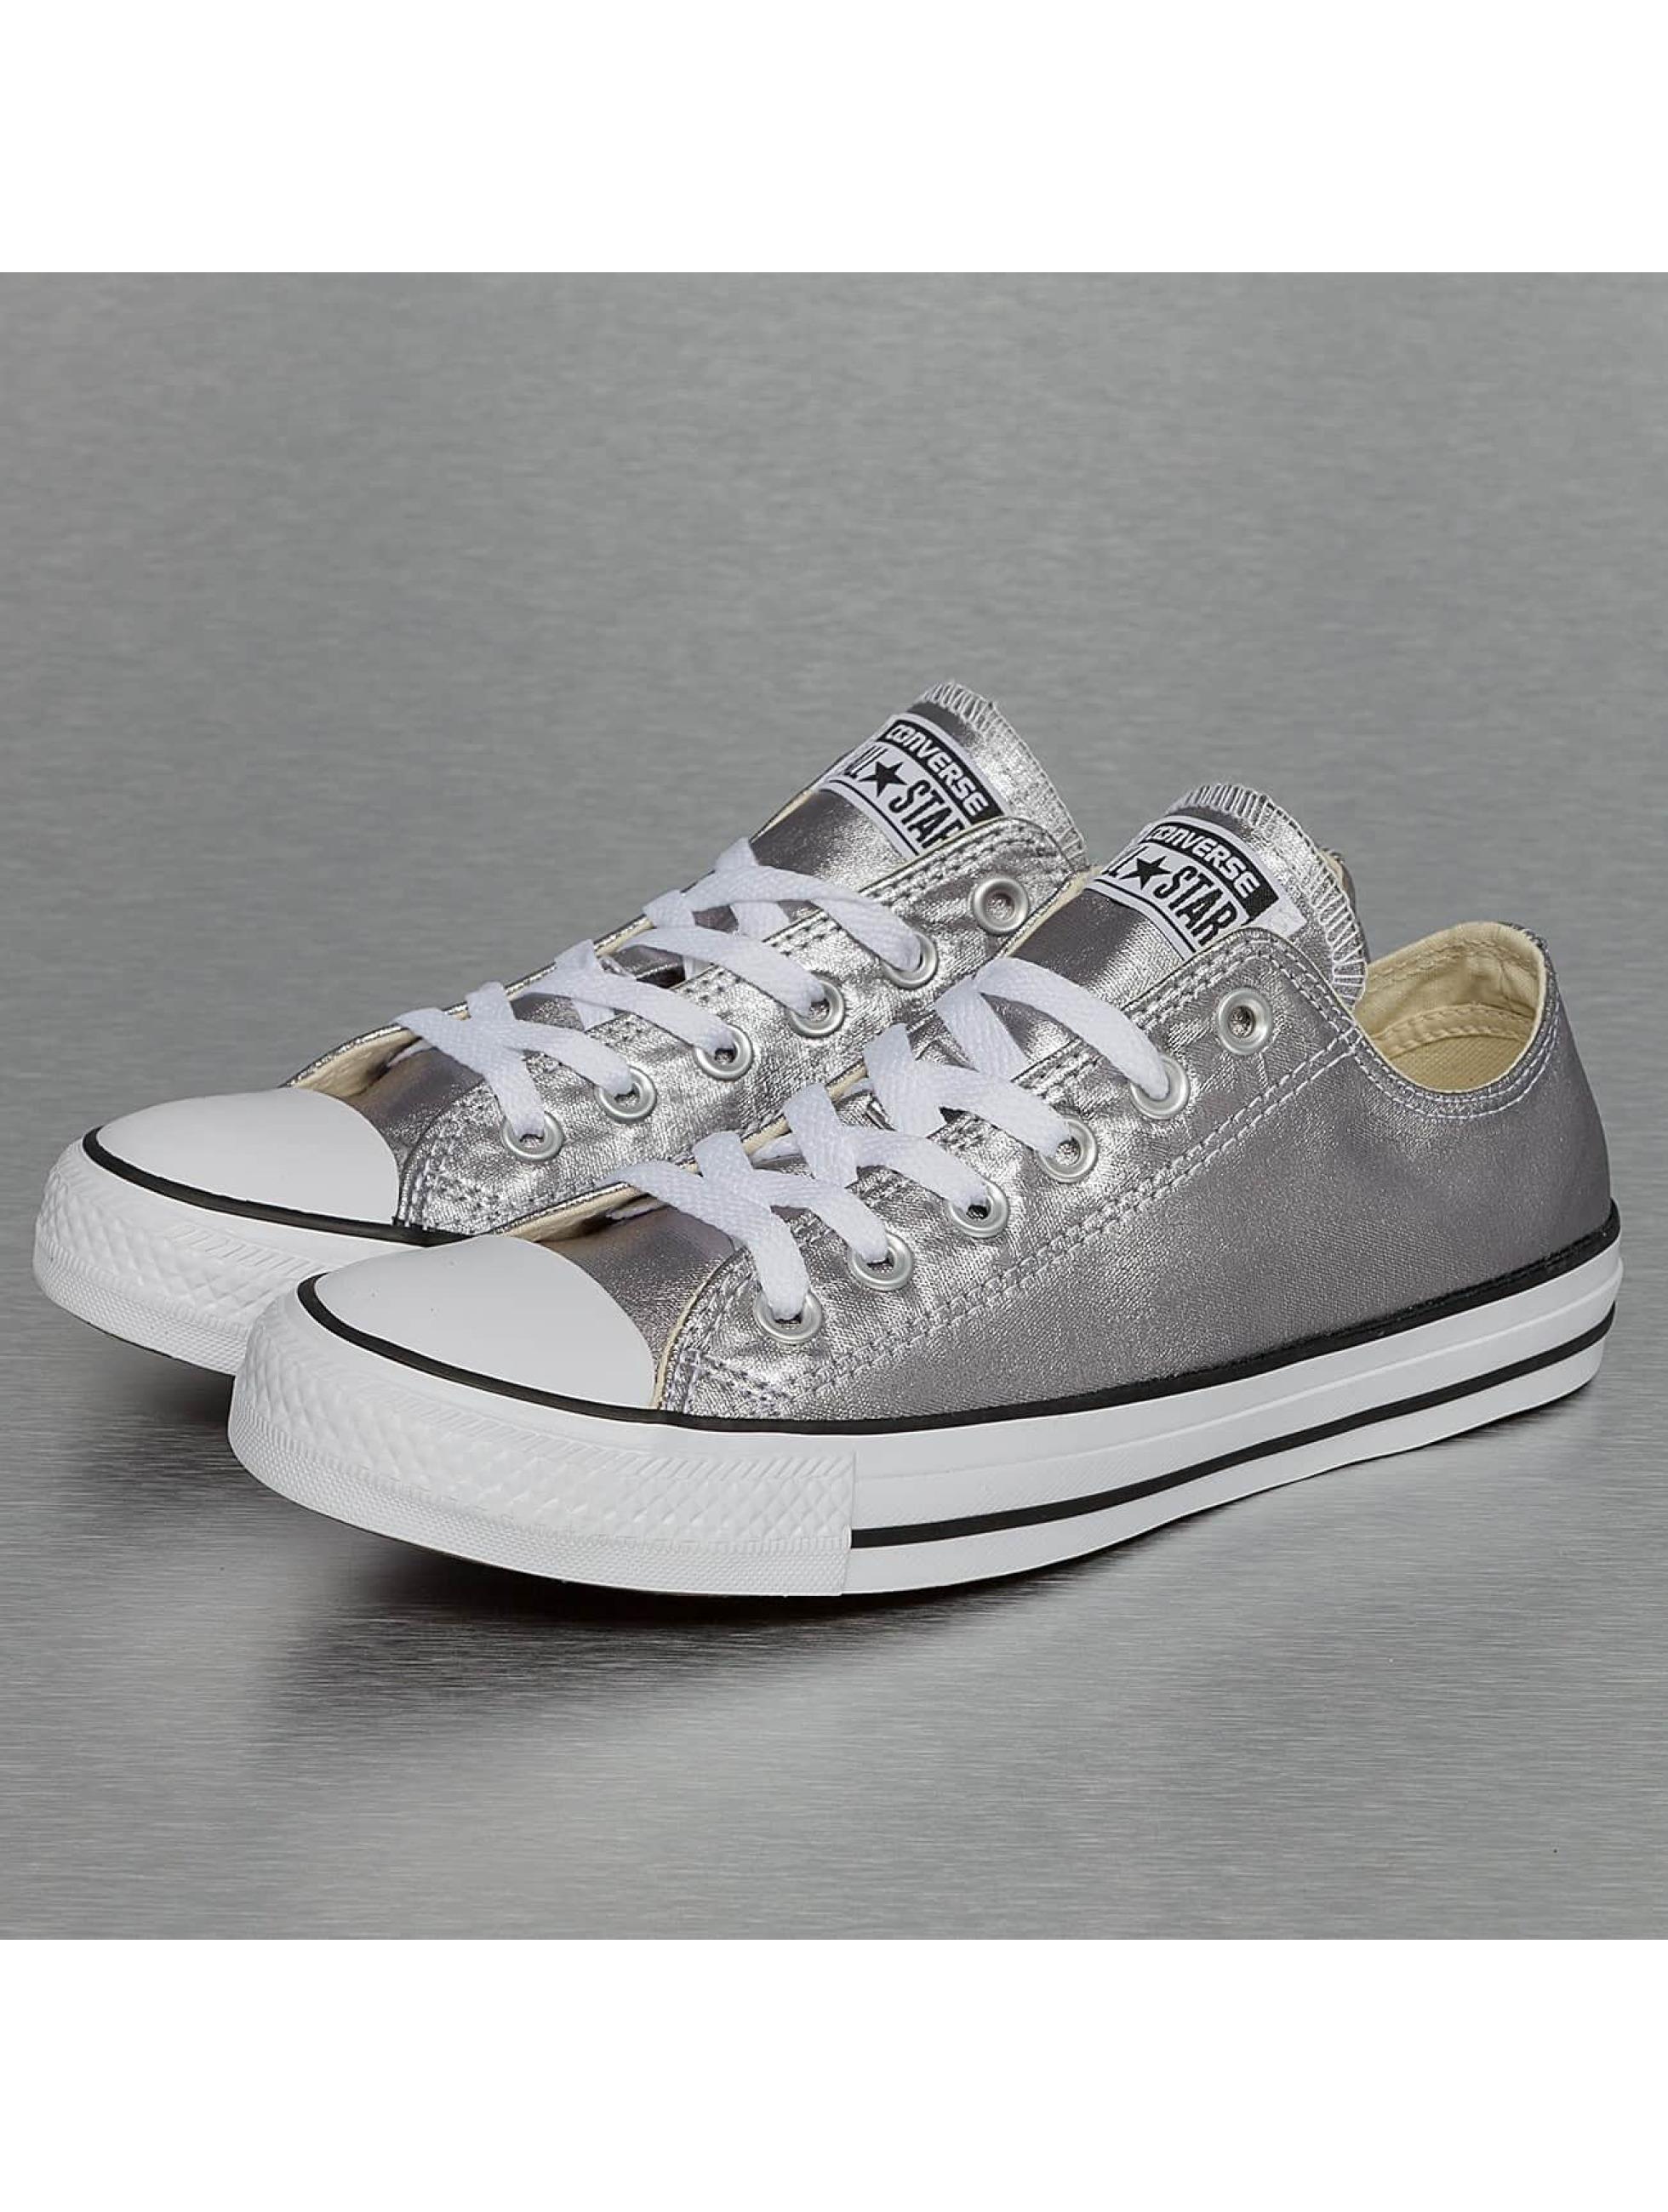 CConverse Chaussures / Baskets Chuck Taylor All Star en gris